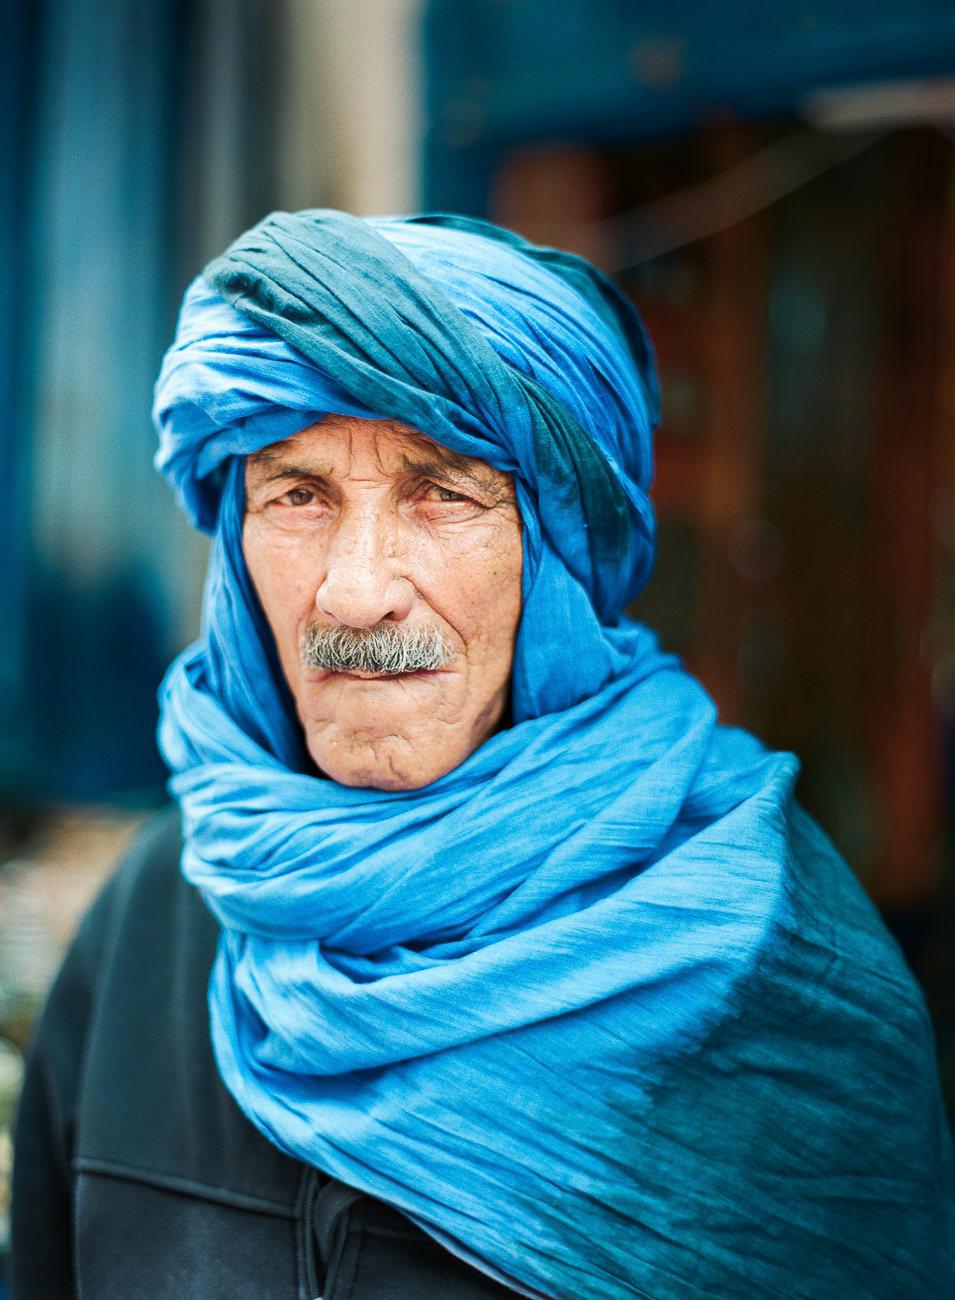 marrakech-photographe-voyage-alain-m-3.jpg